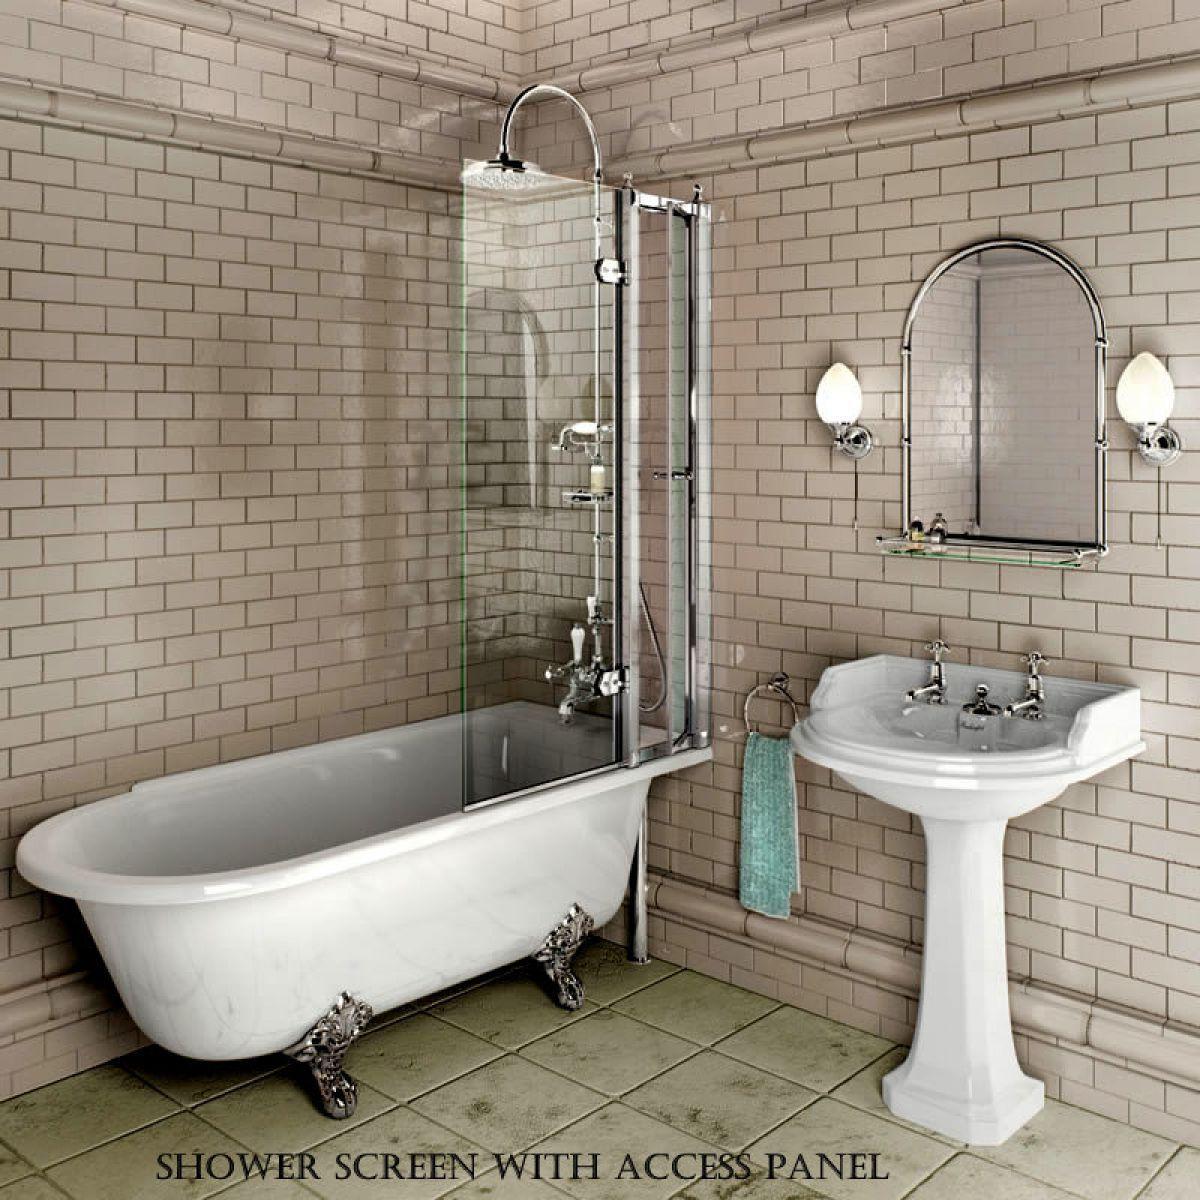 Bathroom Designs 2017 Traditional bathroom images traditional | bathroom design 2017-2018